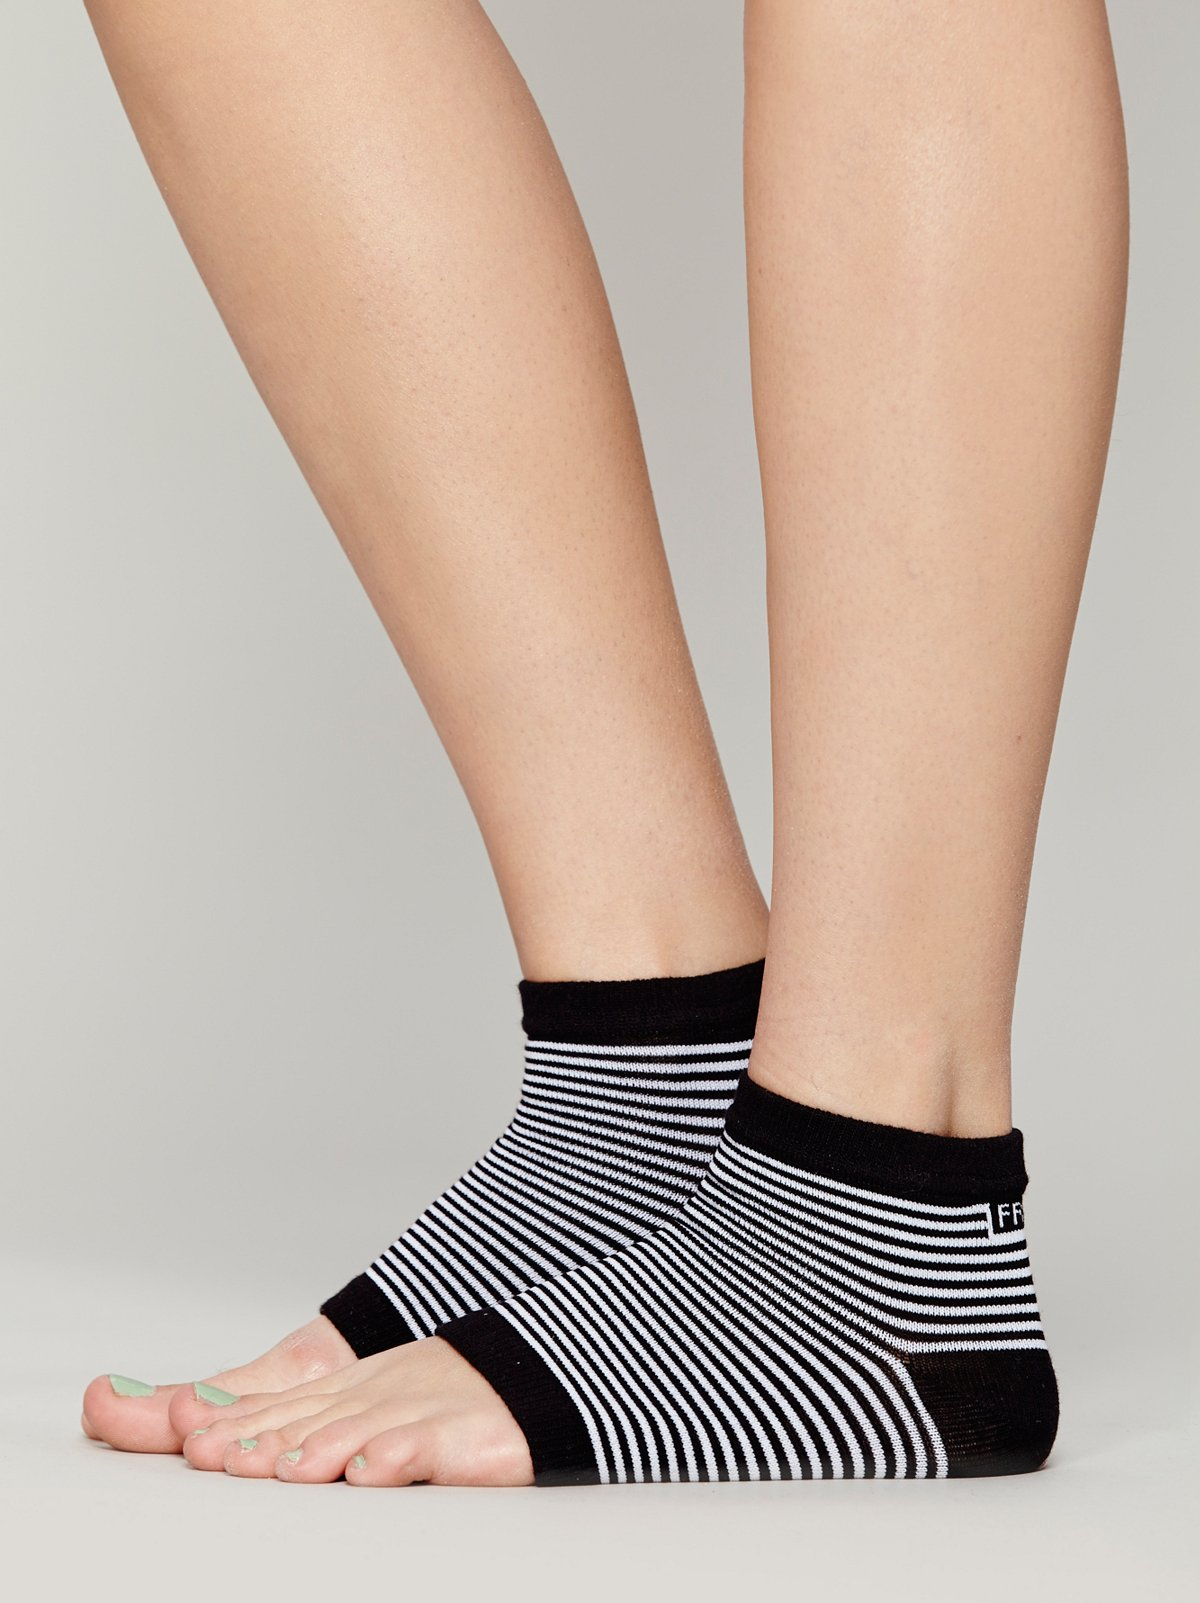 Free Toes Yoga Sock